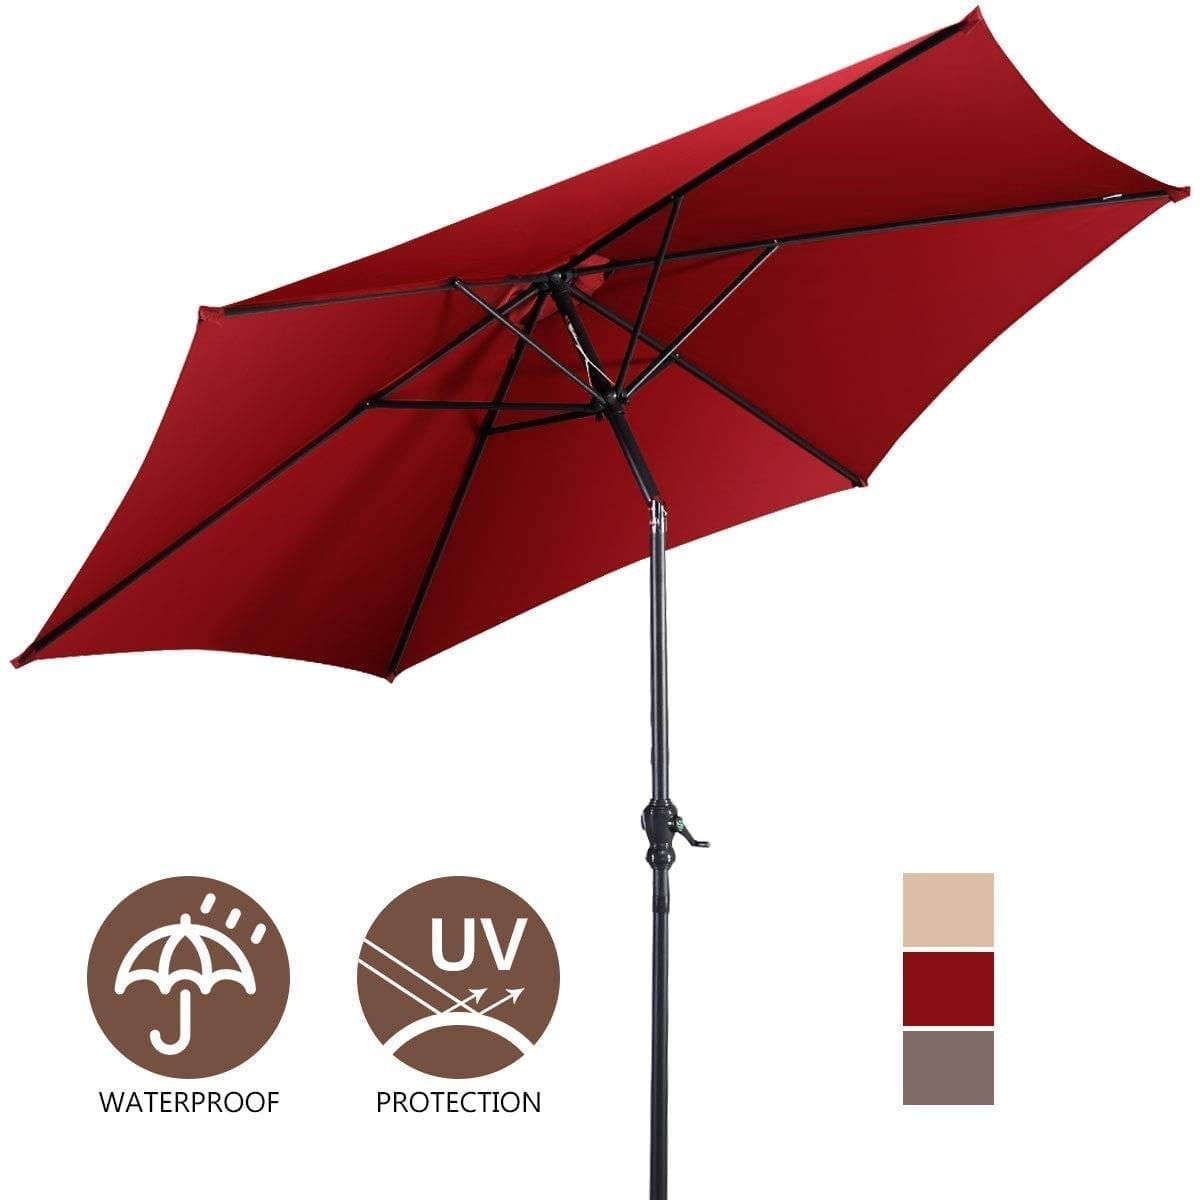 Giantex Large Patio Umbrella With Crank And Tilt Adjustment